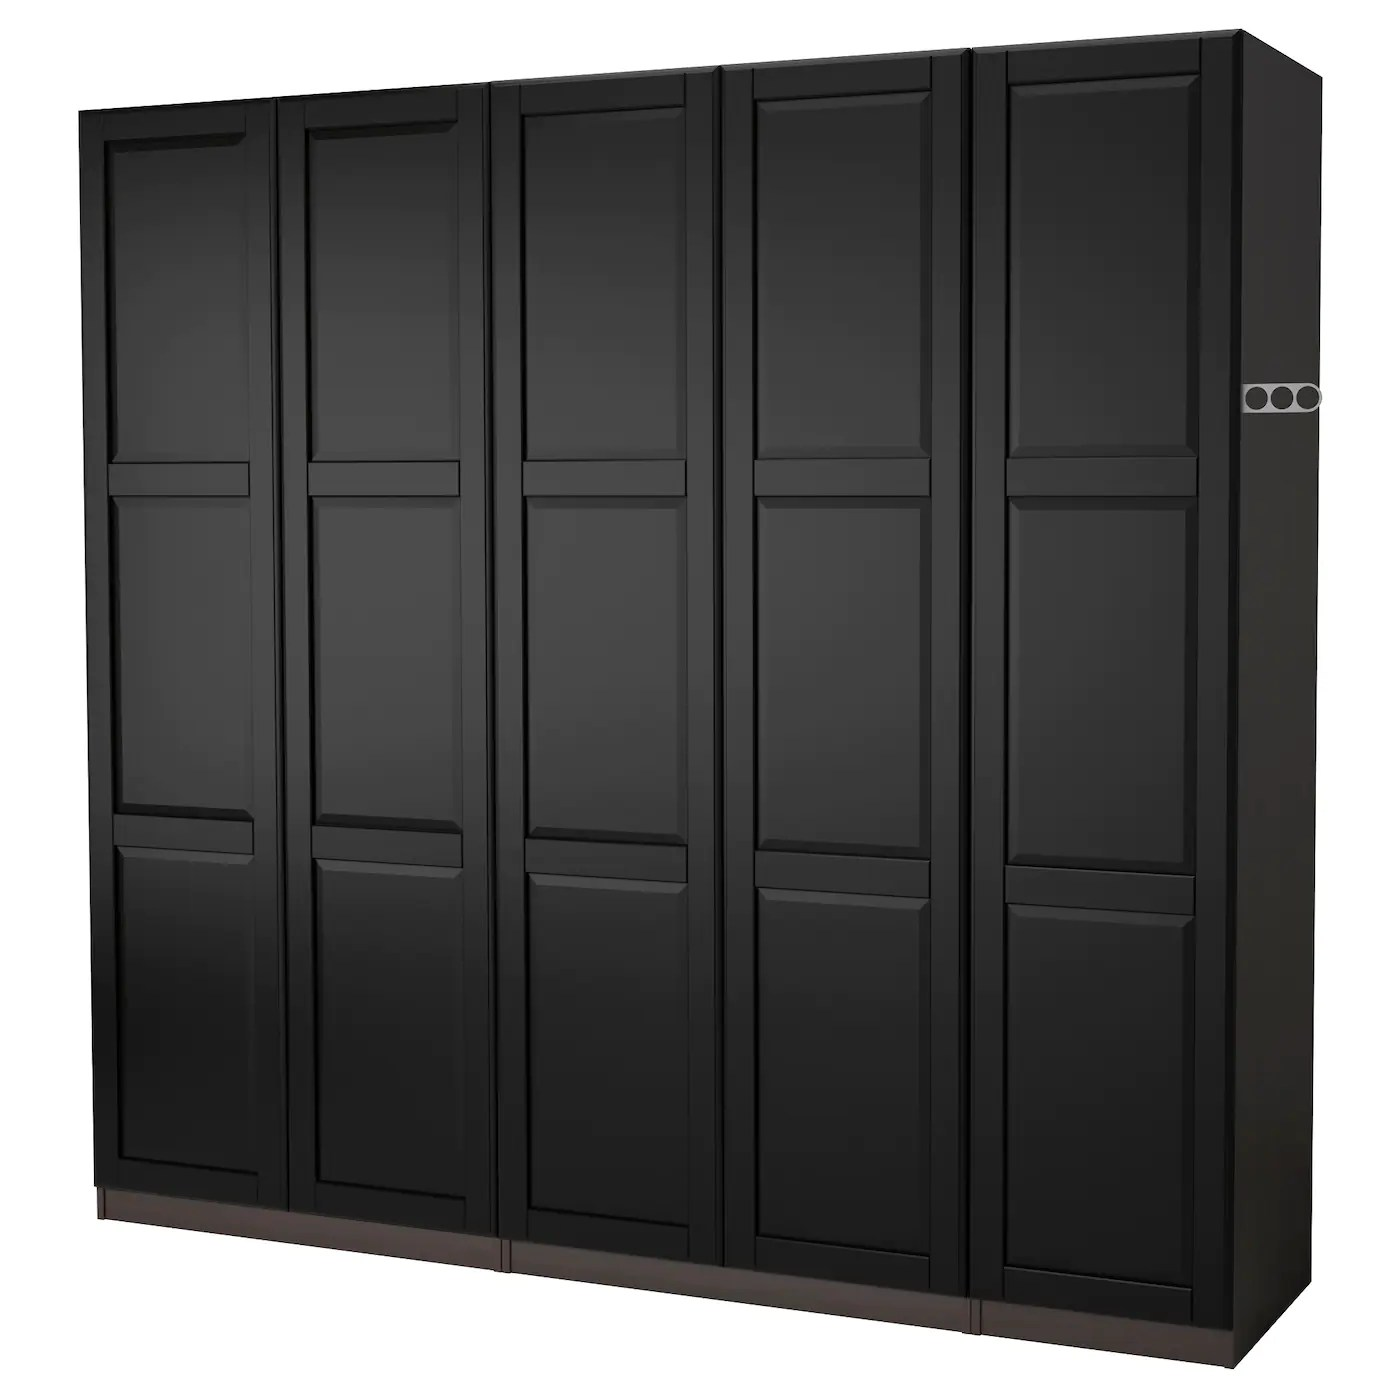 Pax Wardrobe Black Brown Undredal Black 250x60x201 Cm Ikea